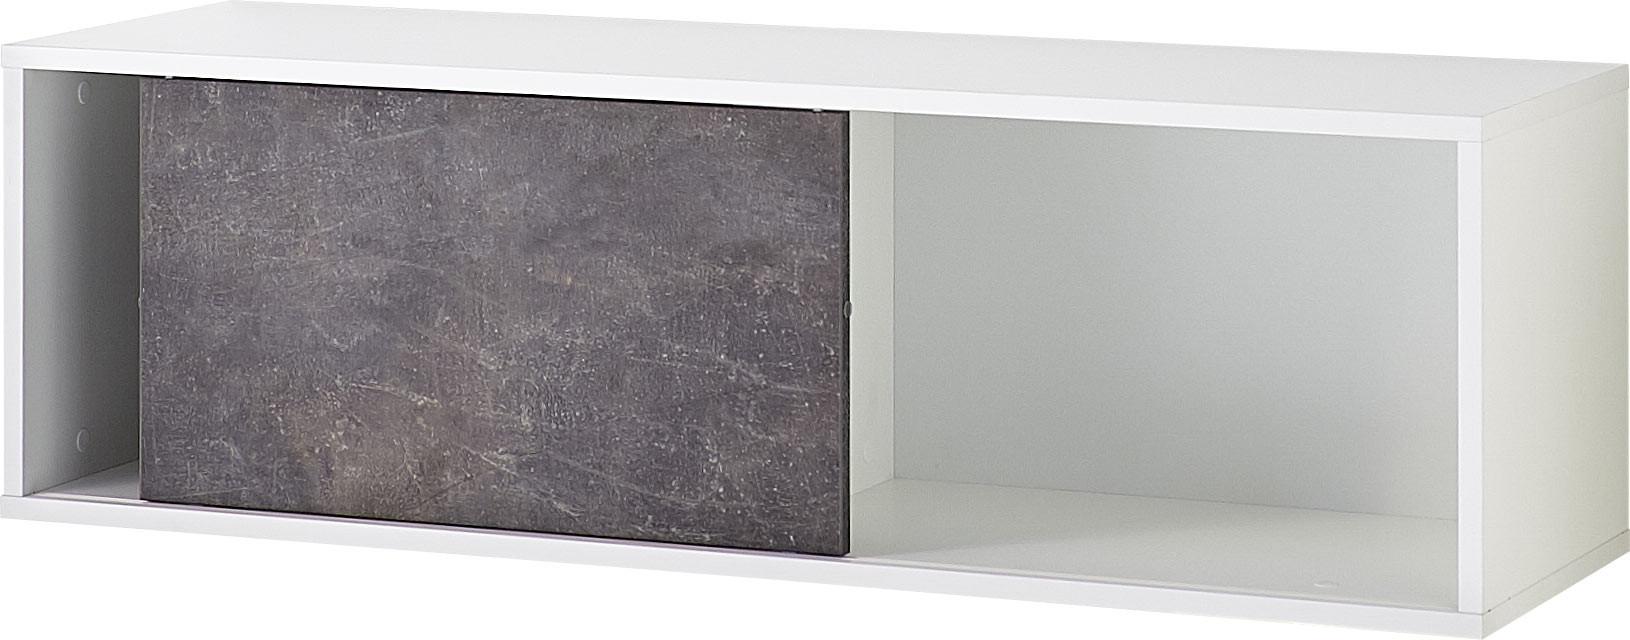 Etagère de bureau suspendue moderne blanc/basalte Mezzo